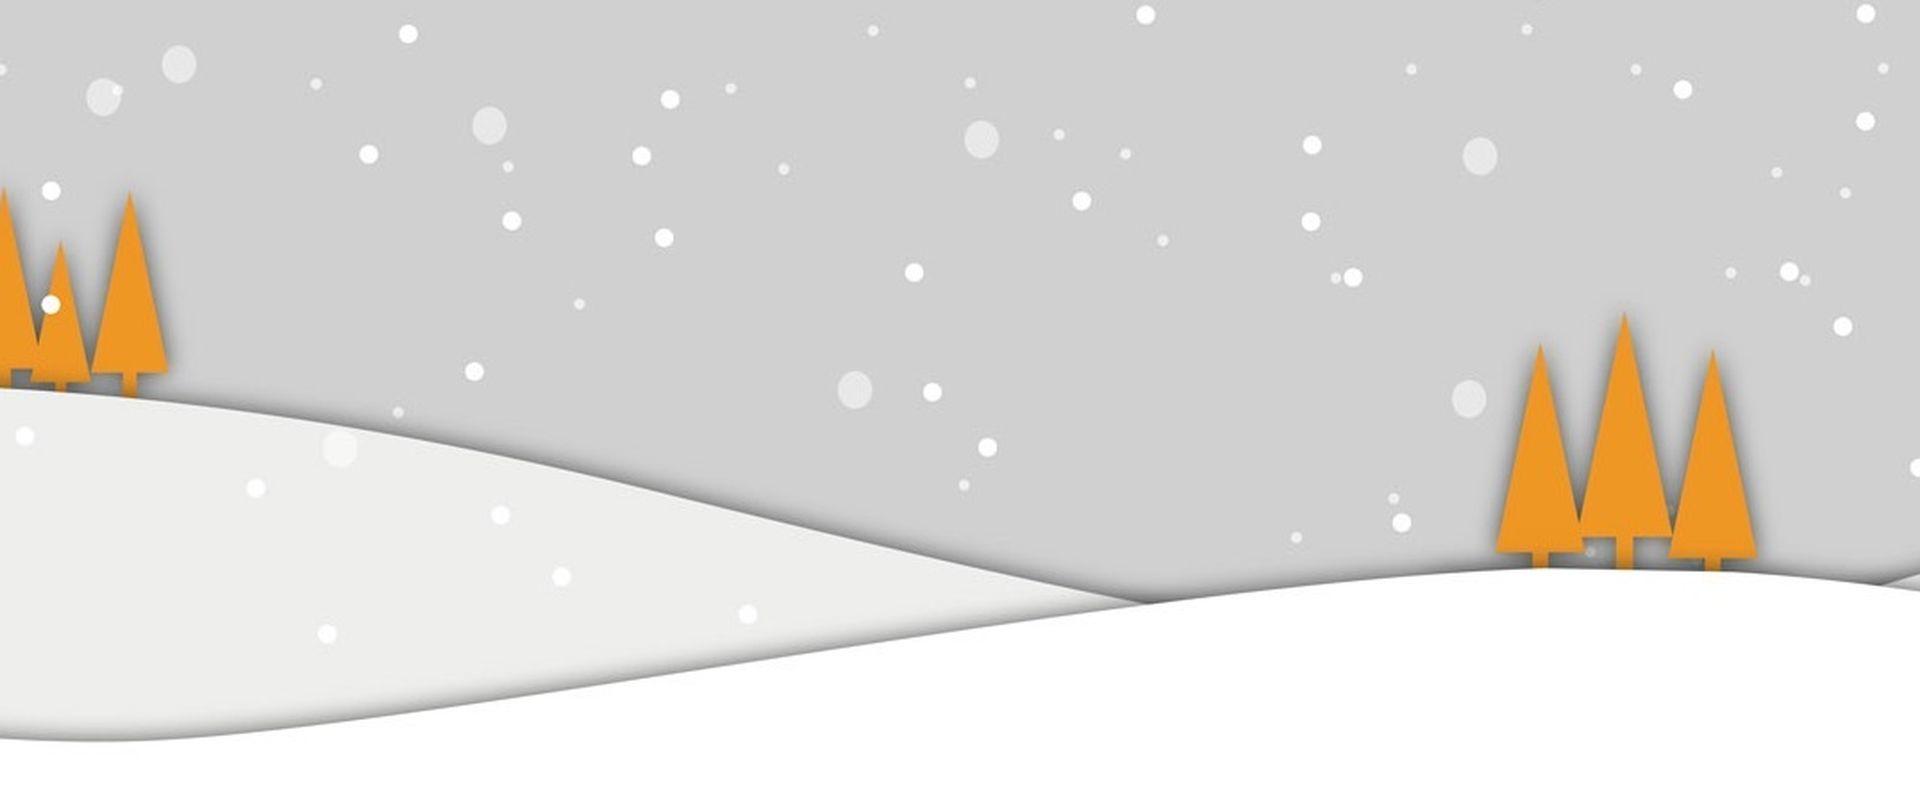 Obdach Wien wünscht frohe Weihnachten